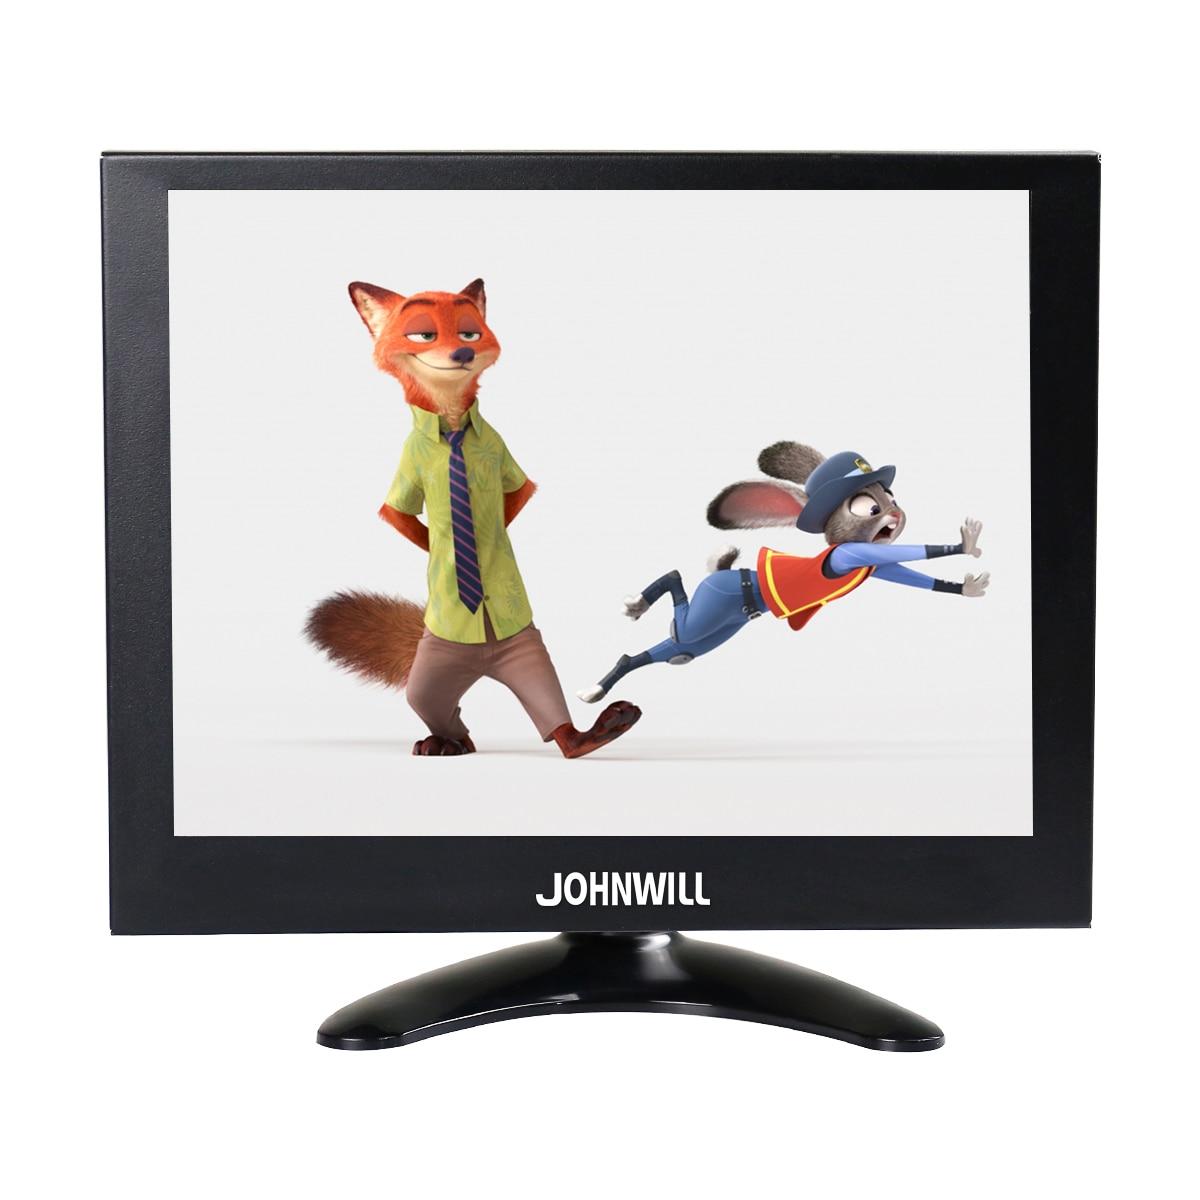 "9.7"" Inch Black Metal Shell 1024x768 HD Portable LCD Display for PS3/xbox PC Camera Viewfinders AV Input/VGA/HDMI/BNC 8"" Monitor"